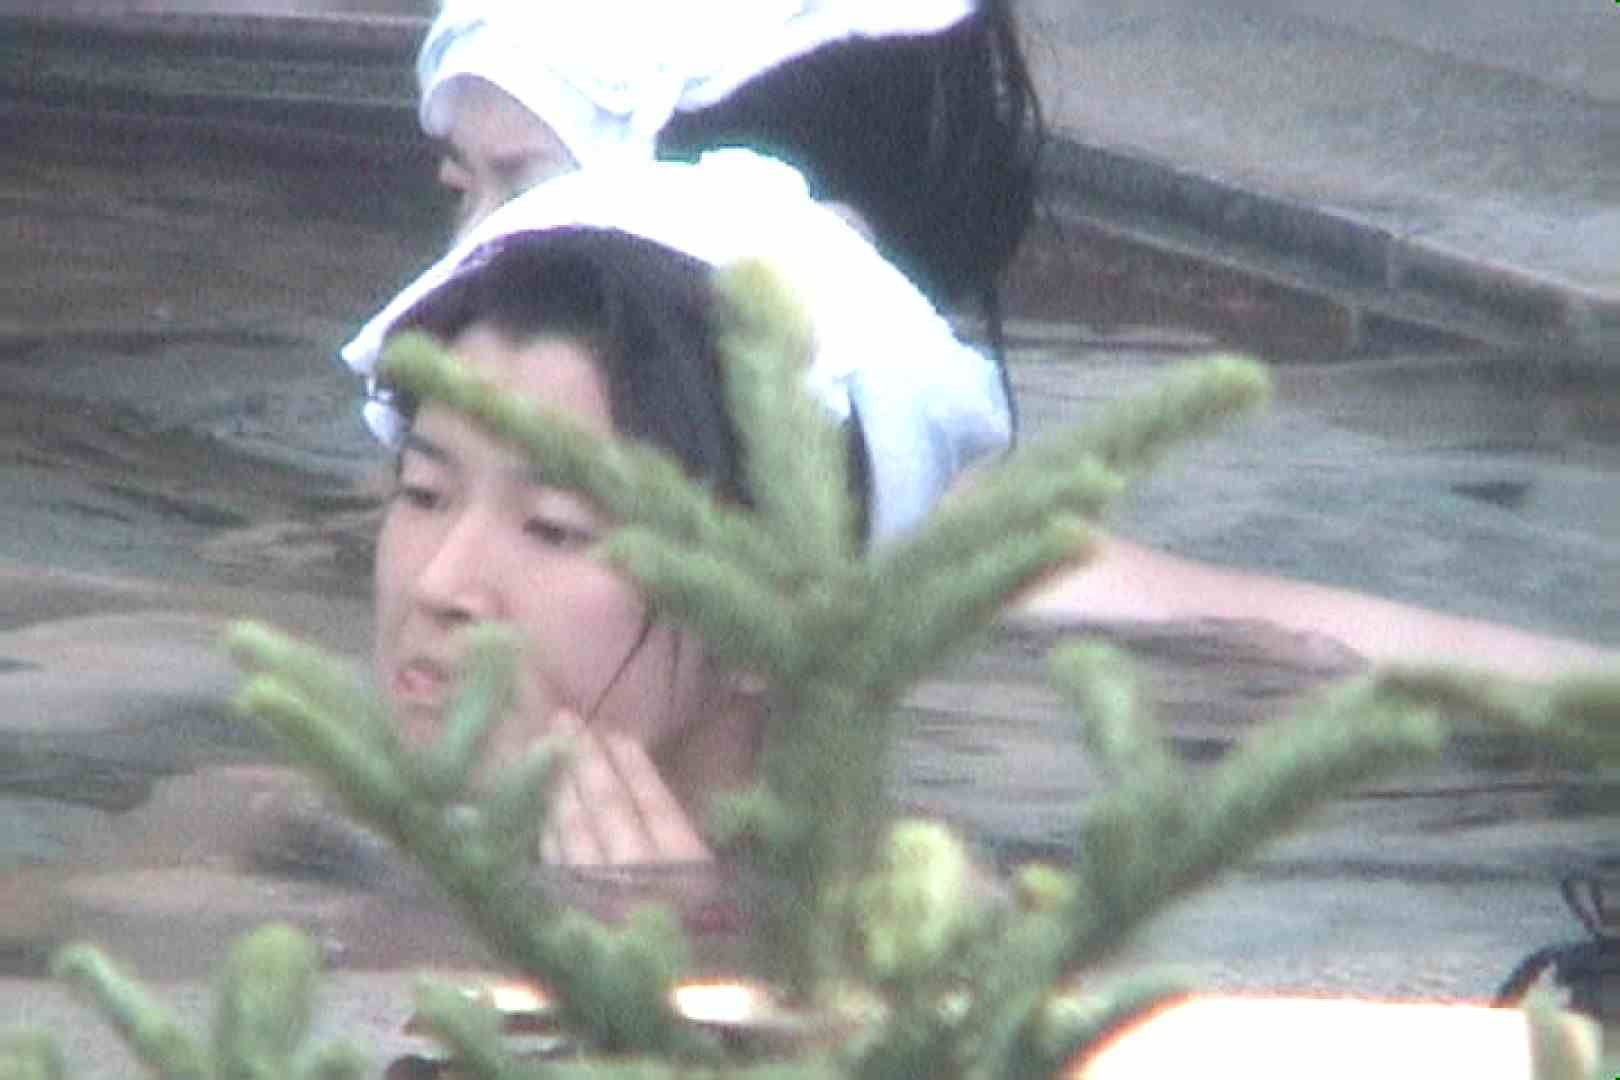 Aquaな露天風呂Vol.80【VIP限定】 露天風呂編  76PIX 70